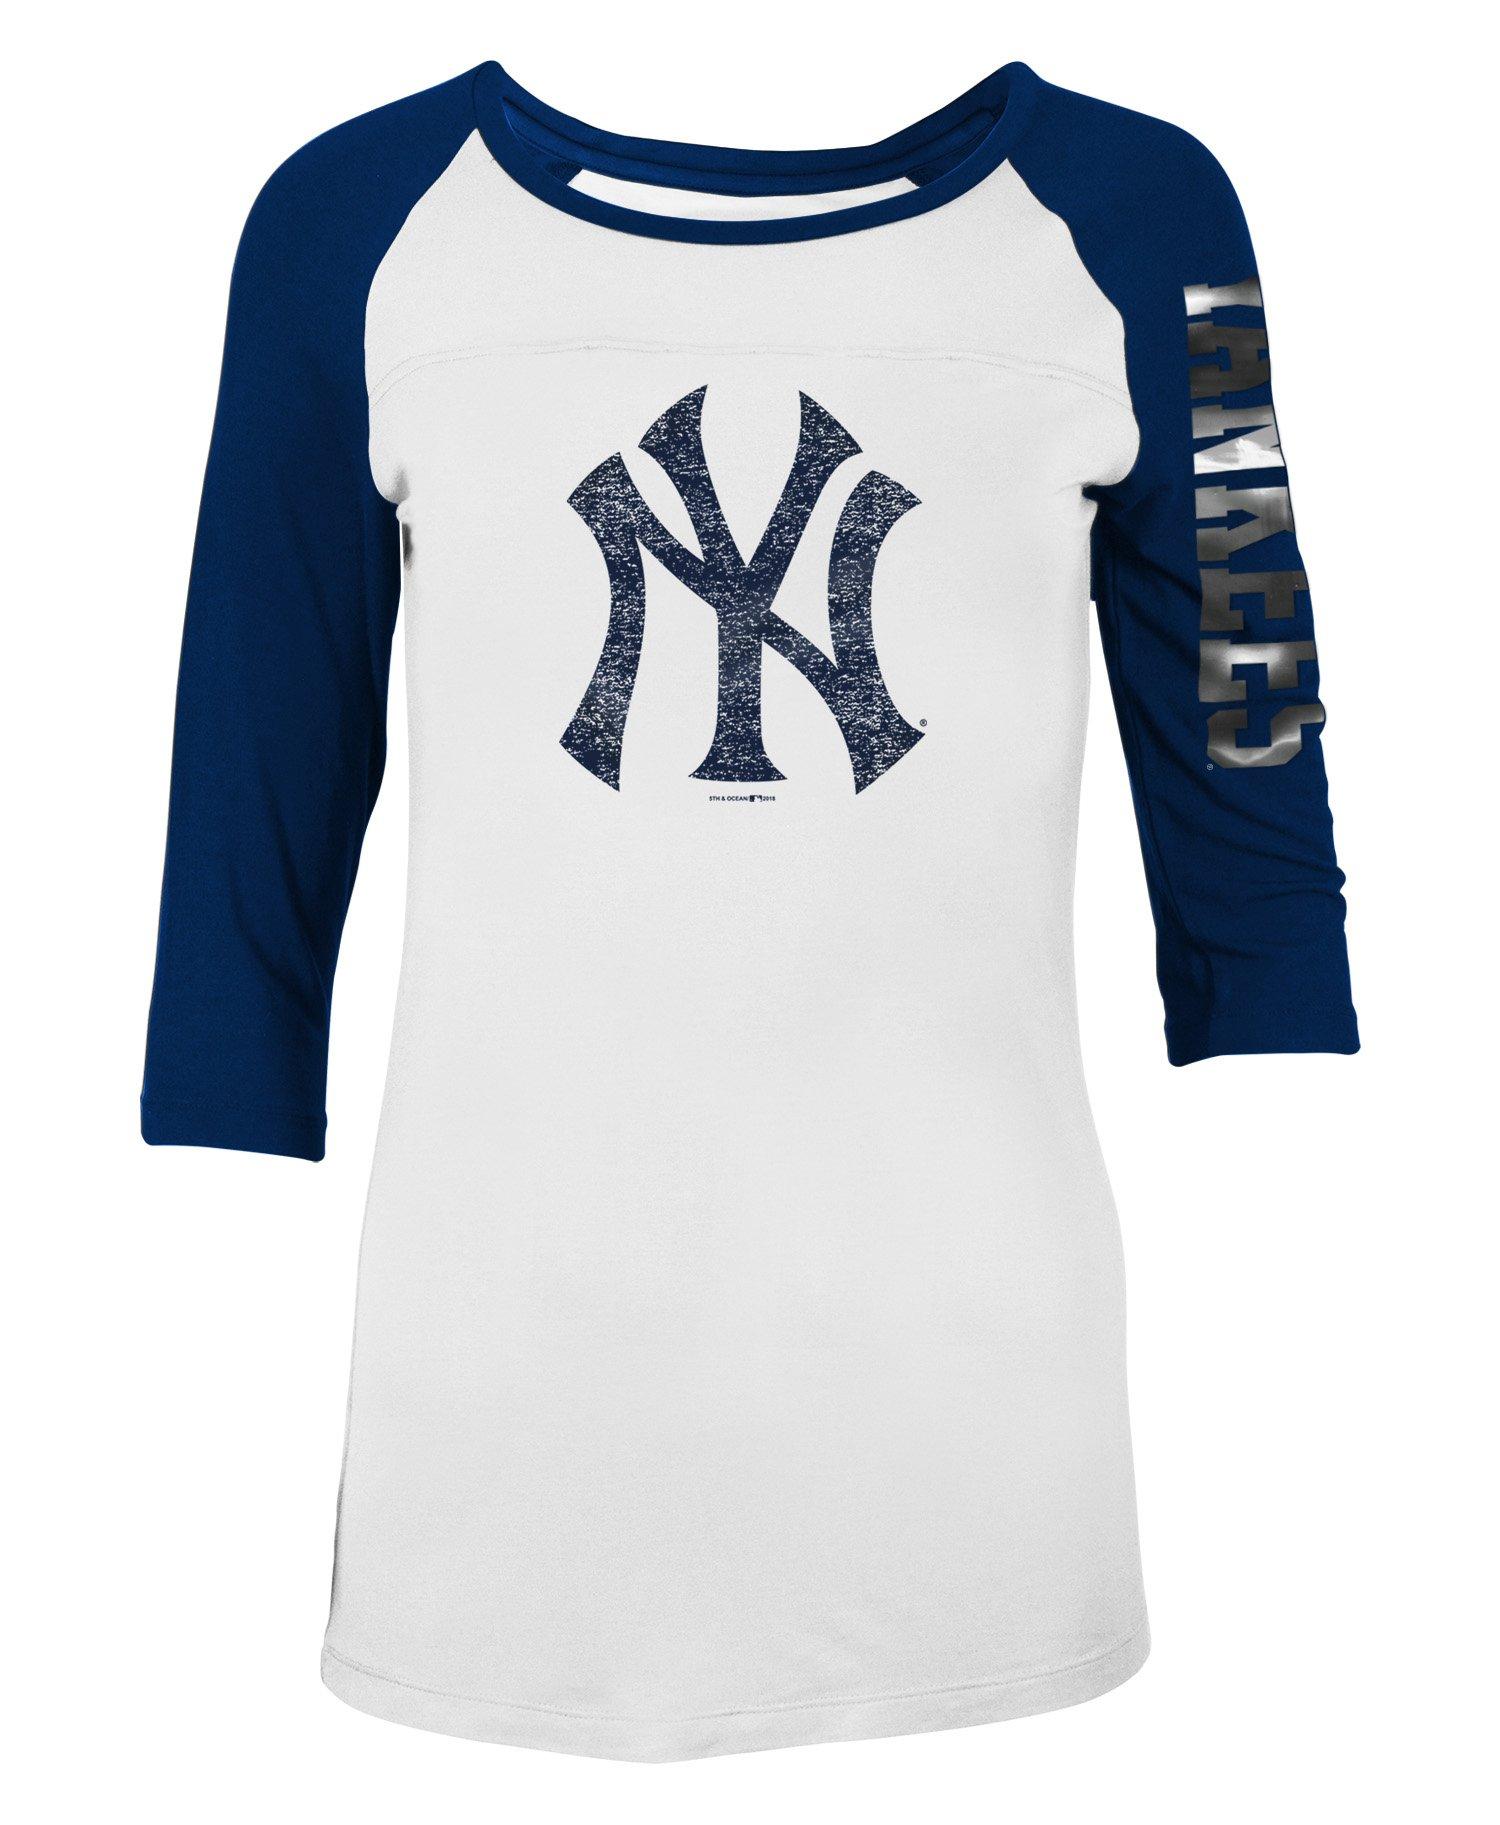 5th & Ocean New York Yankees - Camiseta de Manga 3/4 para Mujer, XXL, Marino: Amazon.es: Ropa y accesorios